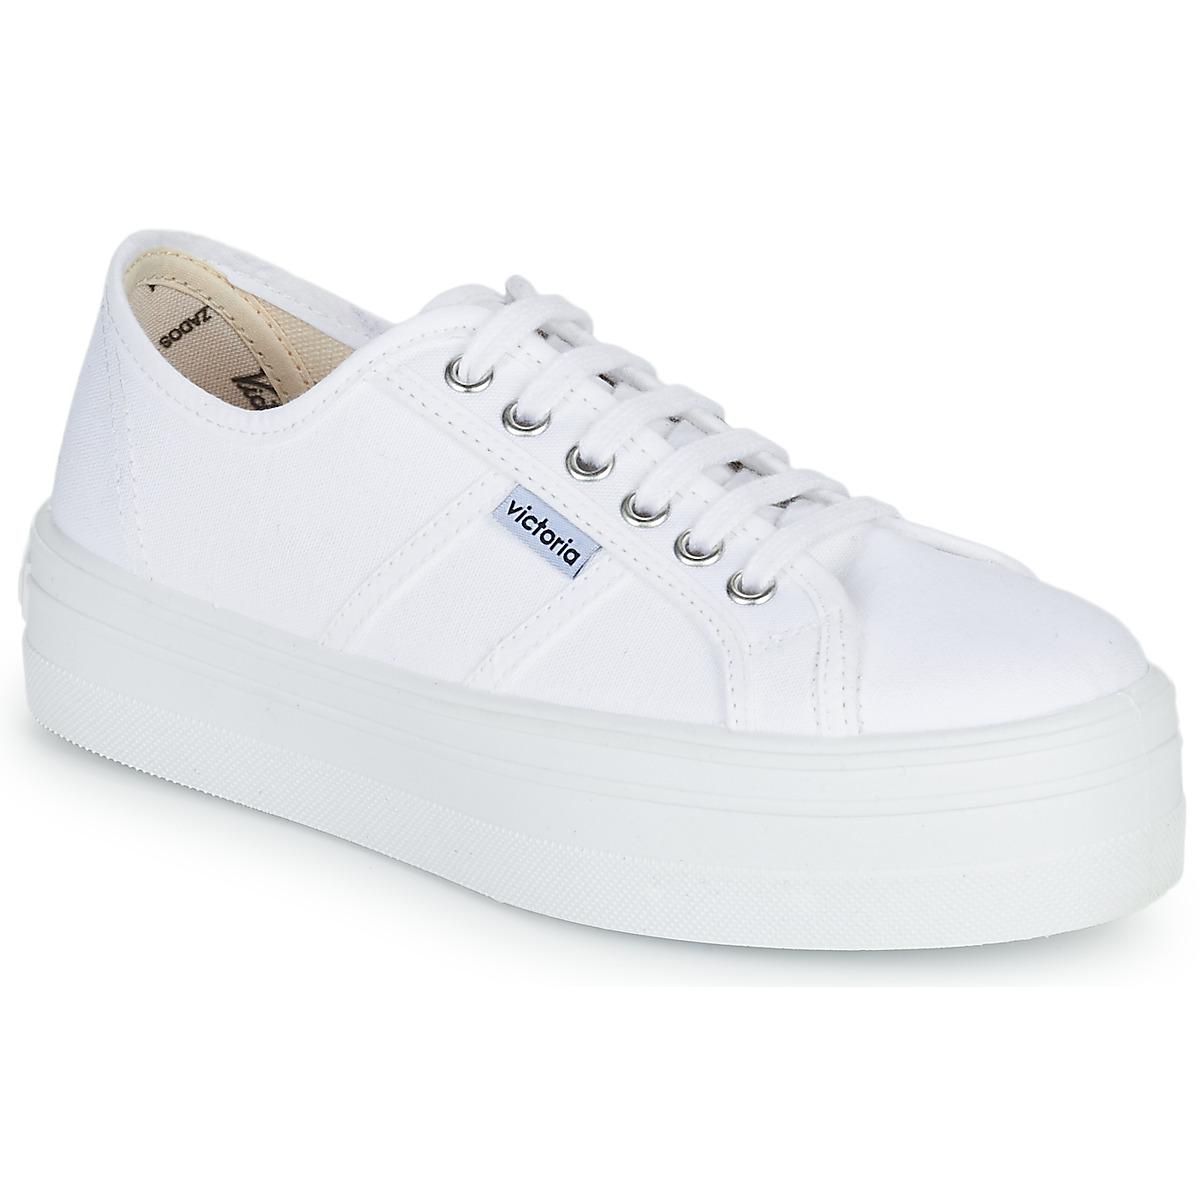 Victoria Sneakers basse BLUCHER LONA PLATAFORMA spartoo-shoes beige Sportivo Finishline Venta En Línea hgRgbwI